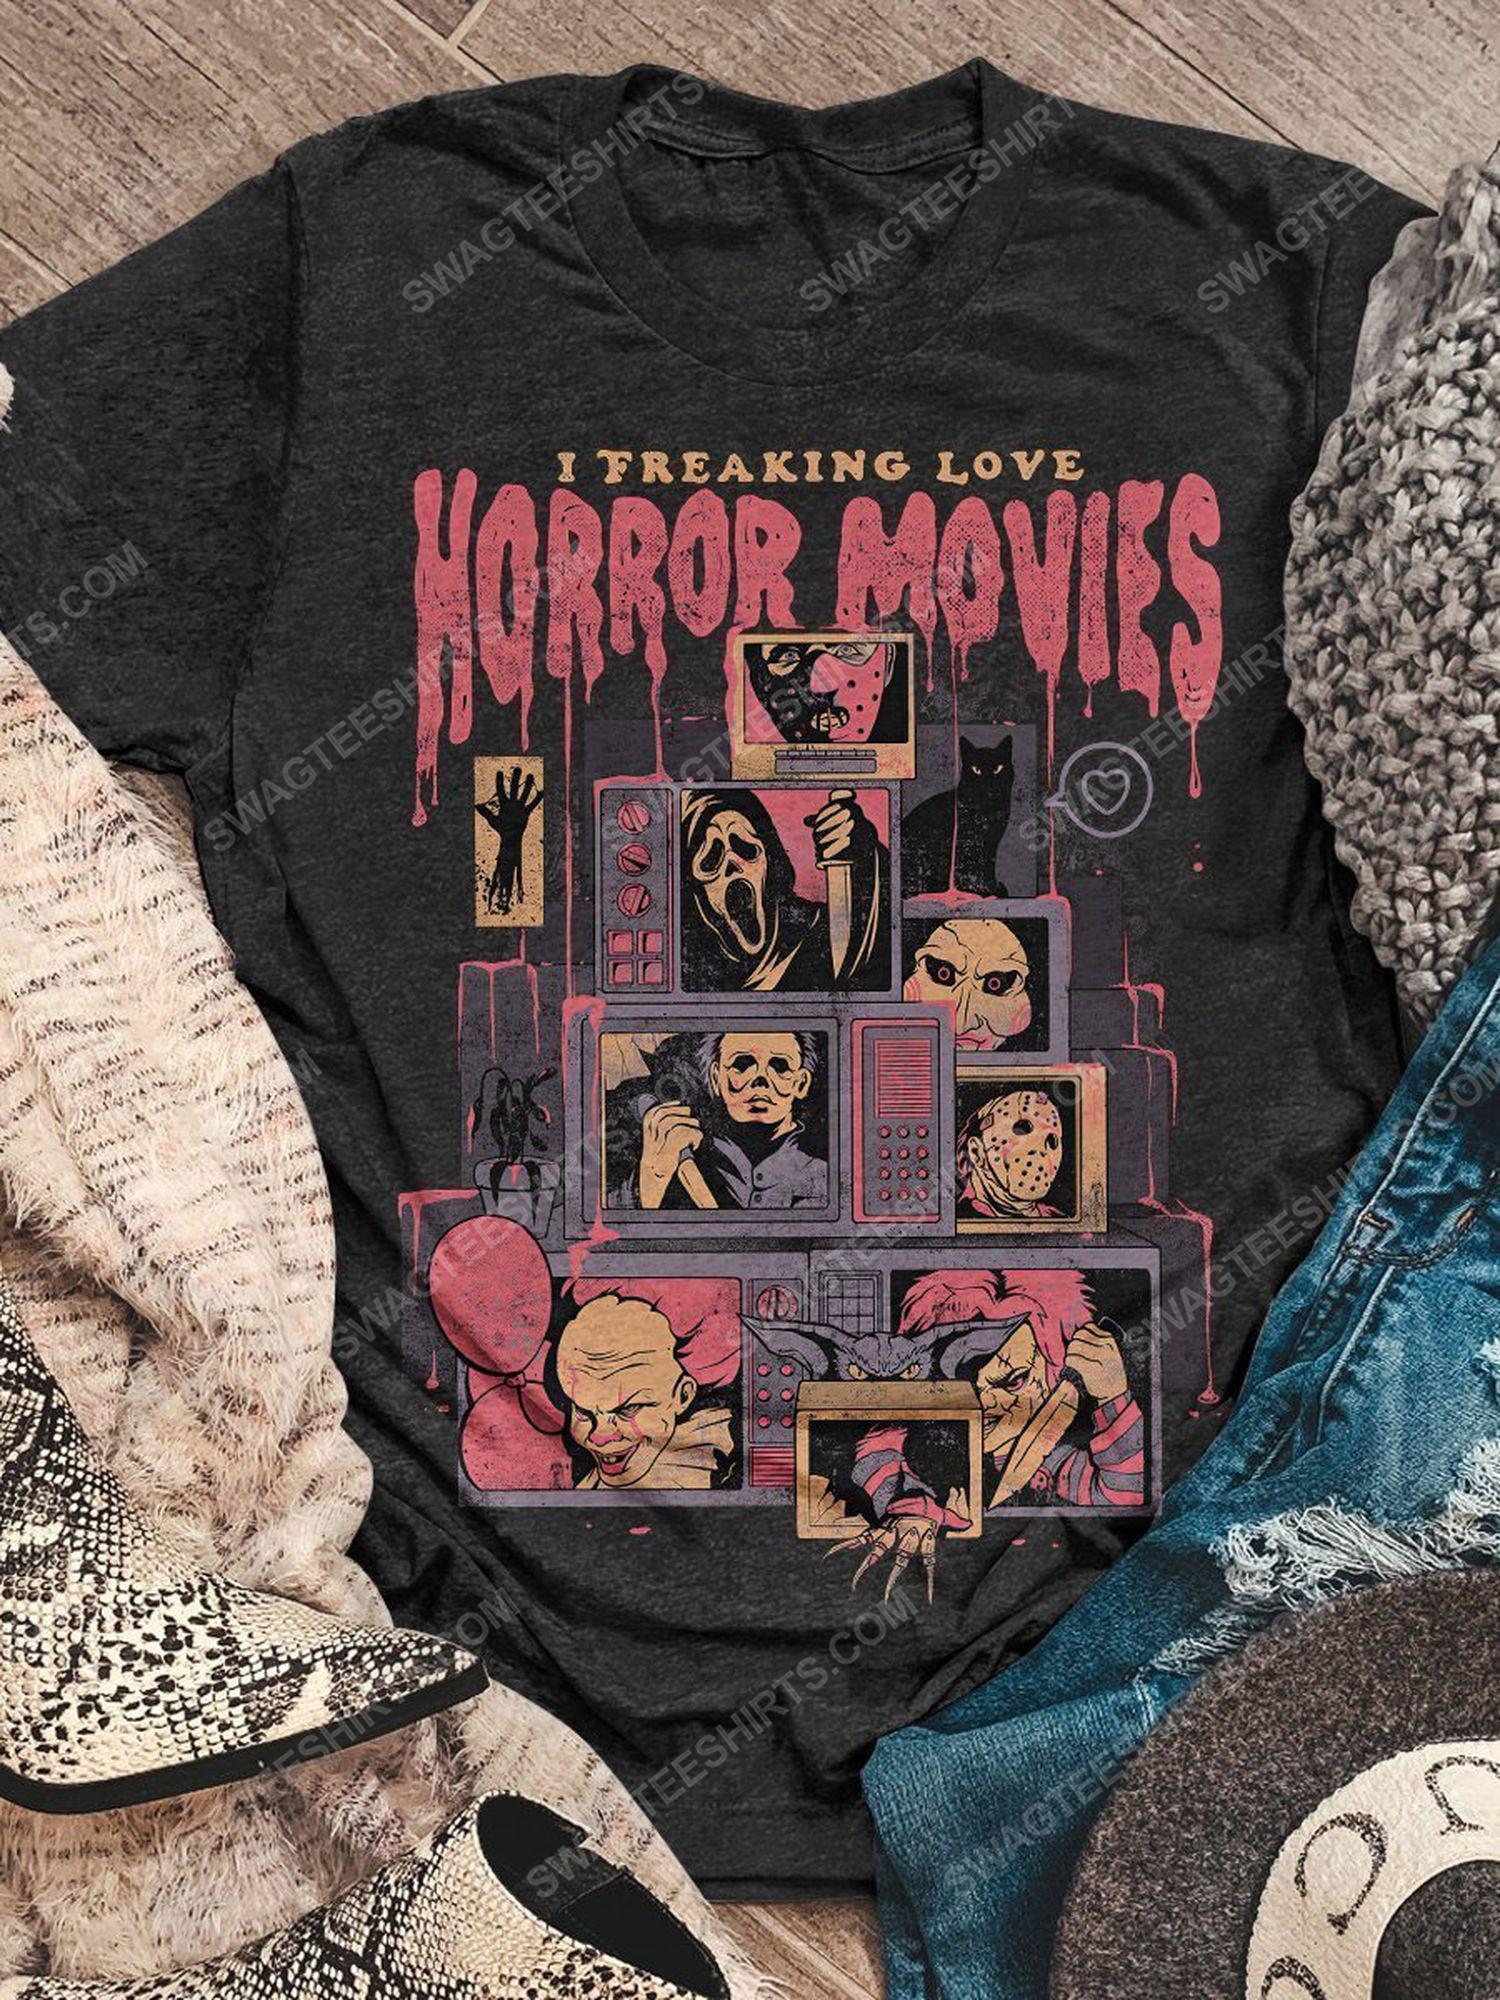 Halloween i freaking love horror movies vintage shirt 1 - Copy